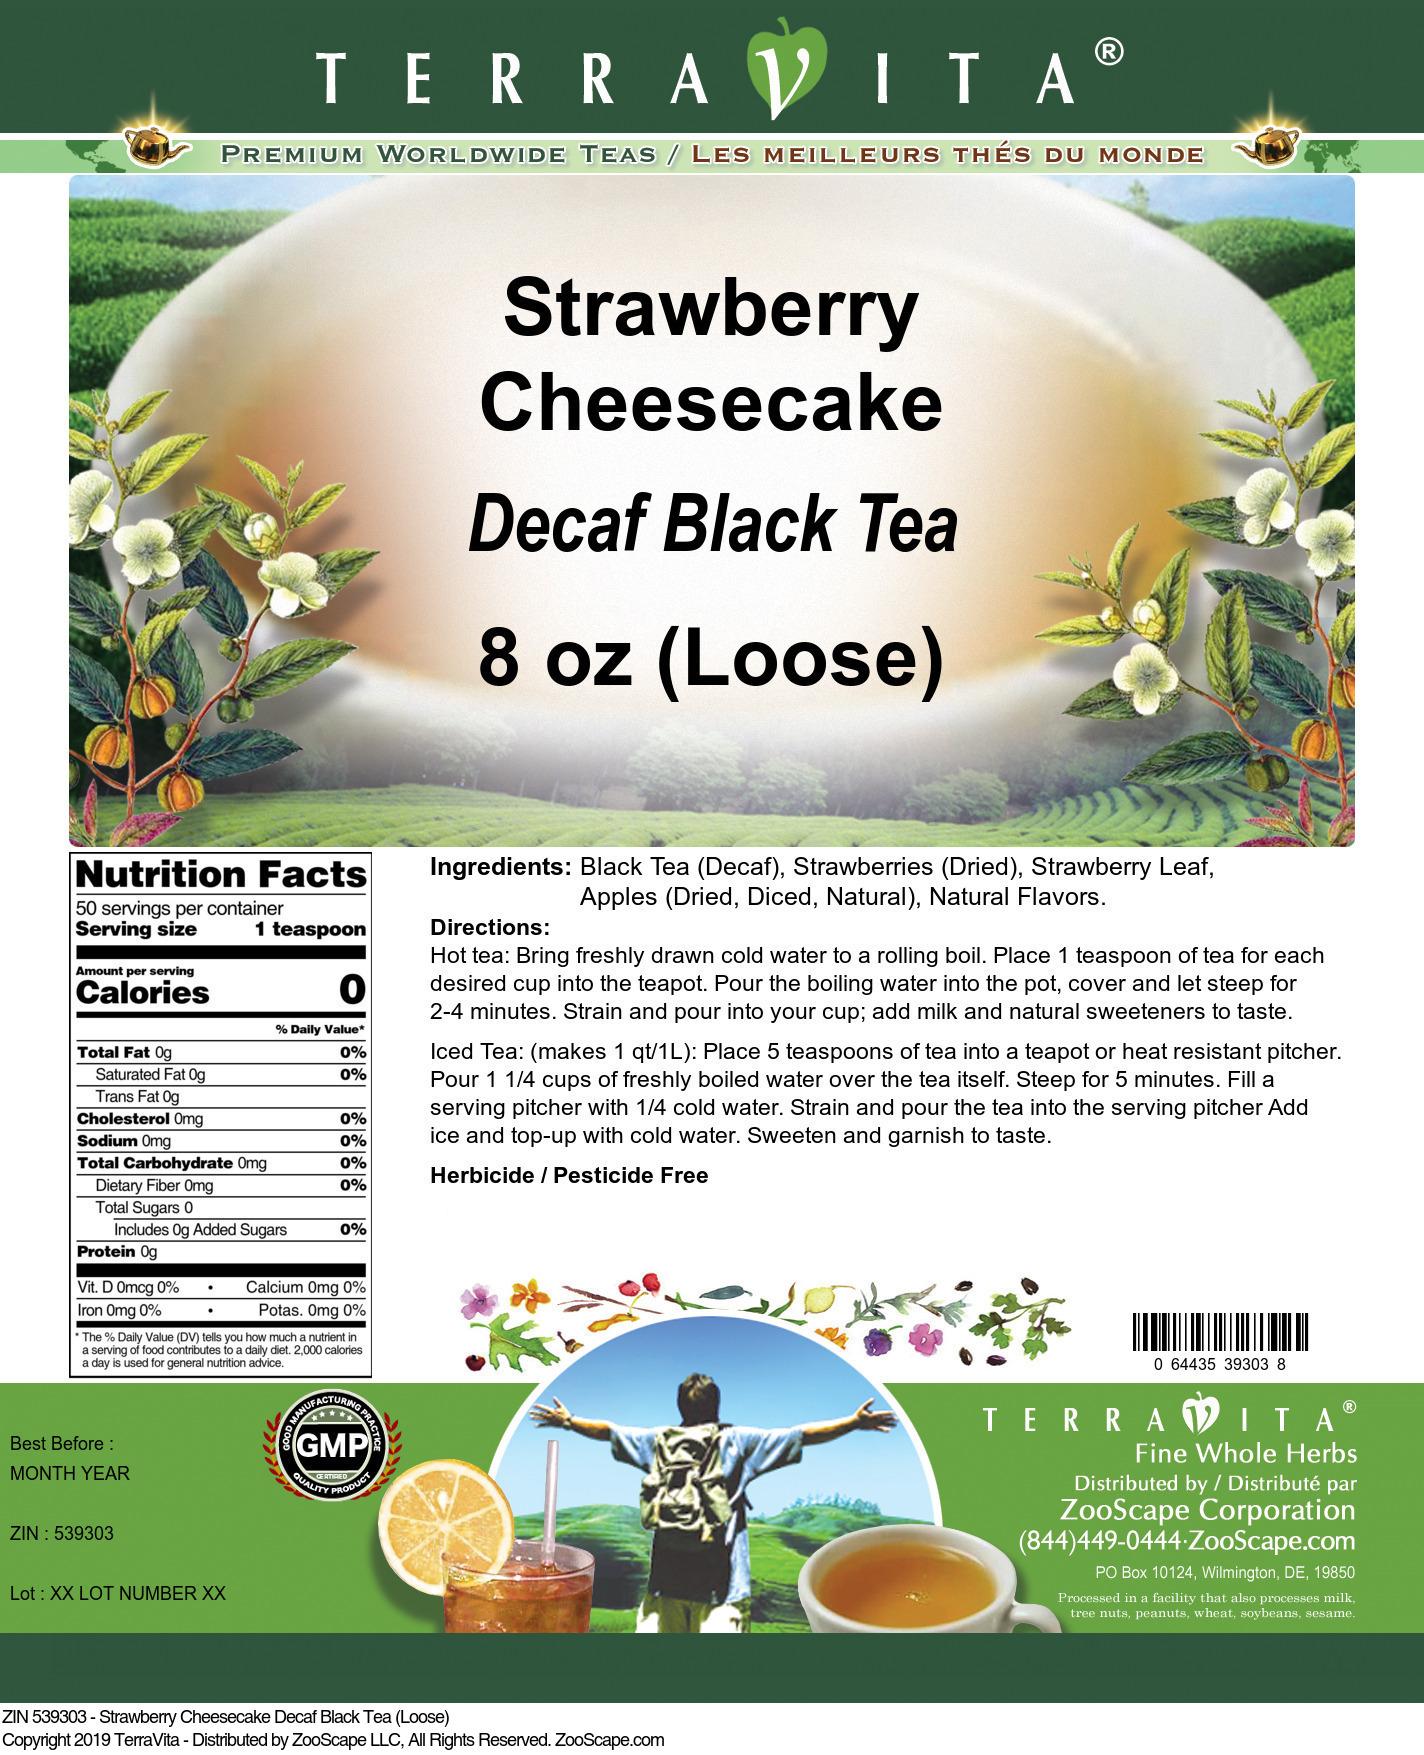 Strawberry Cheesecake Decaf Black Tea (Loose)